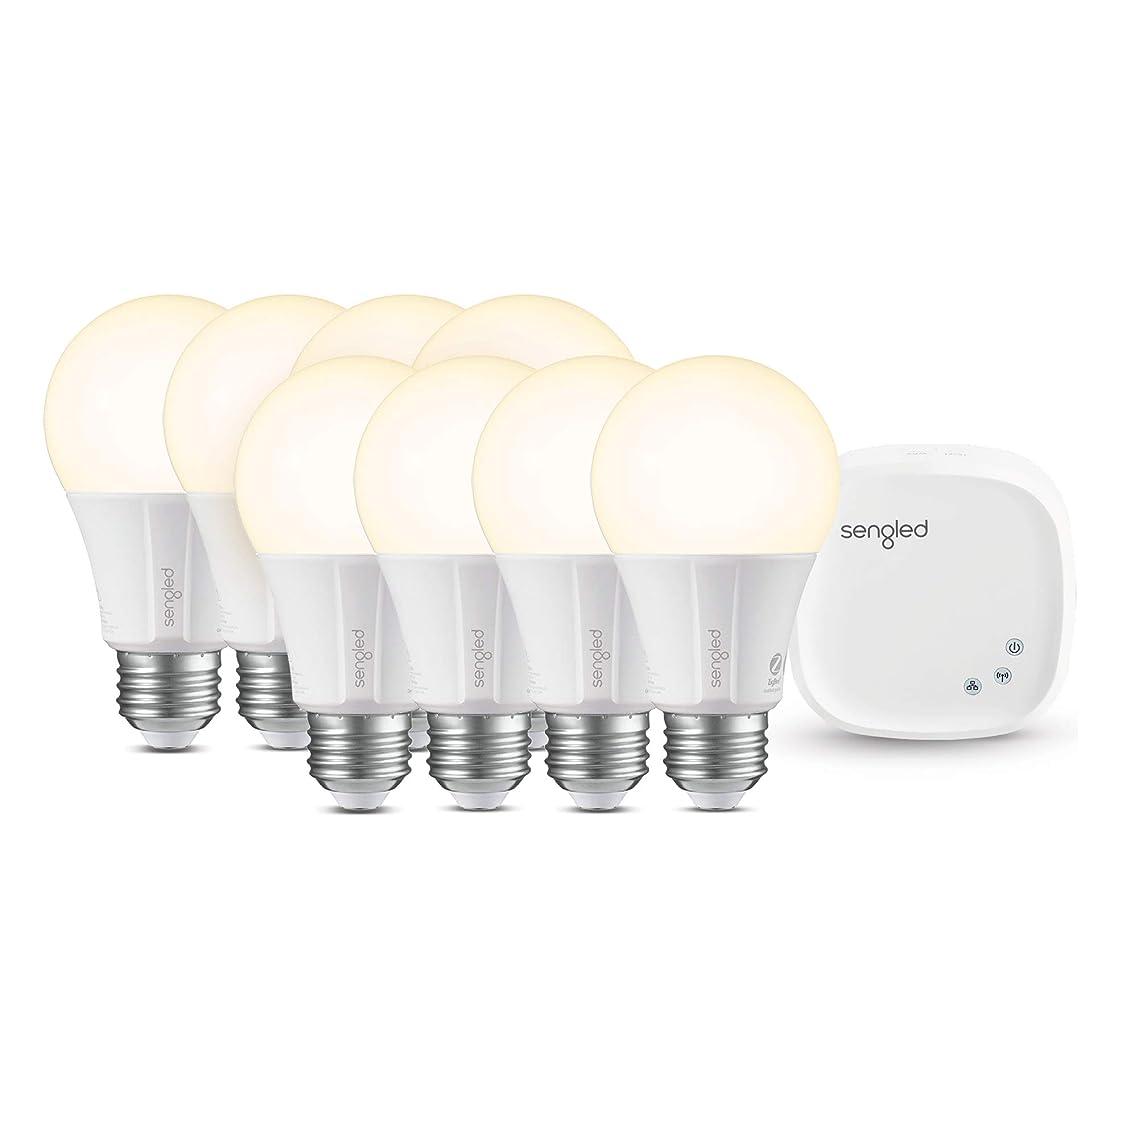 Sengled Smart LED Soft White A19 Starter Kit, 2700K 60W Equivalent, 8 Light Bulbs & Hub, Works with Alexa & Google Assistant